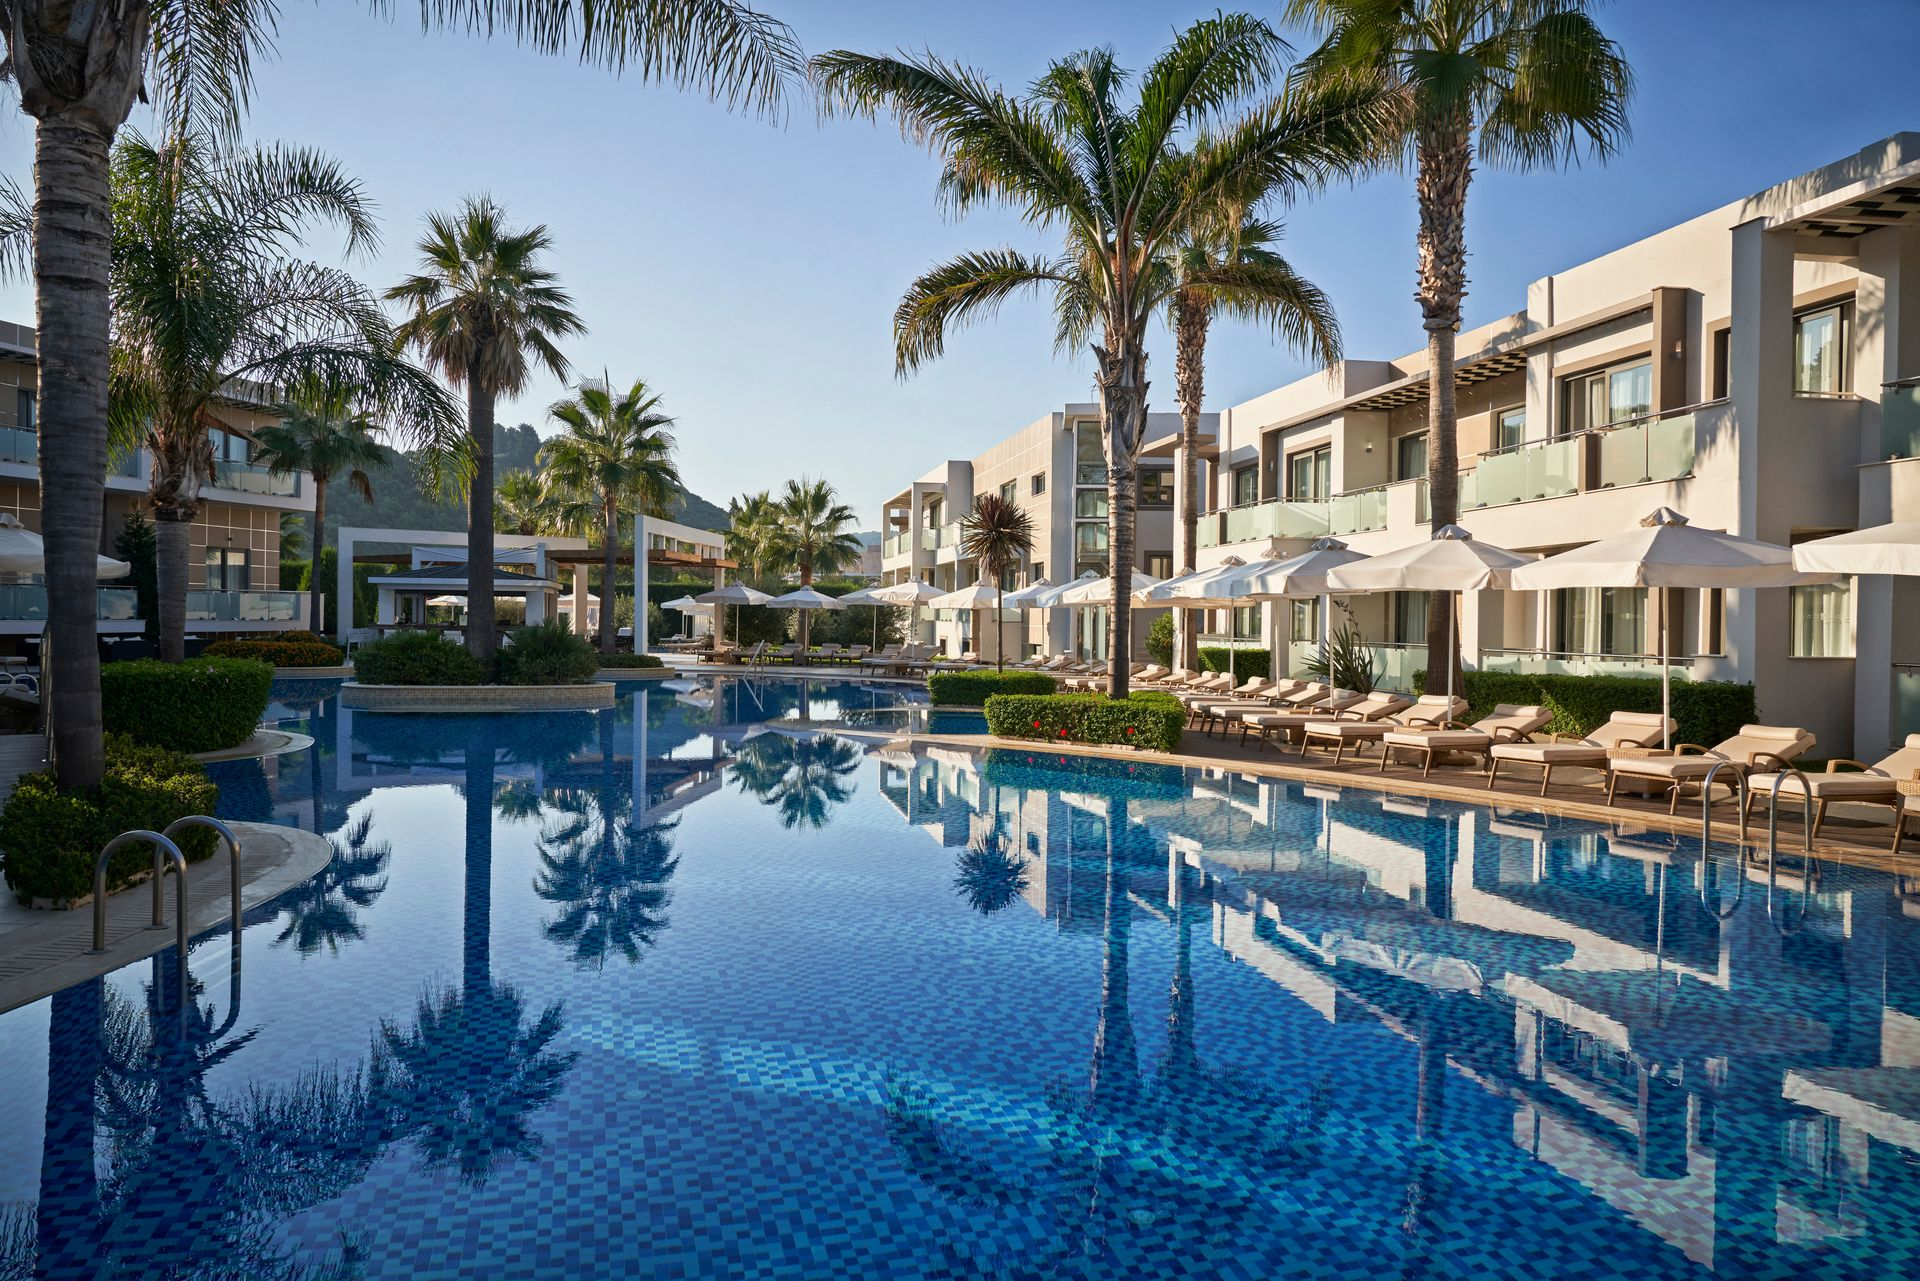 Lesante Classic - Preferred Hotels amp; Resorts